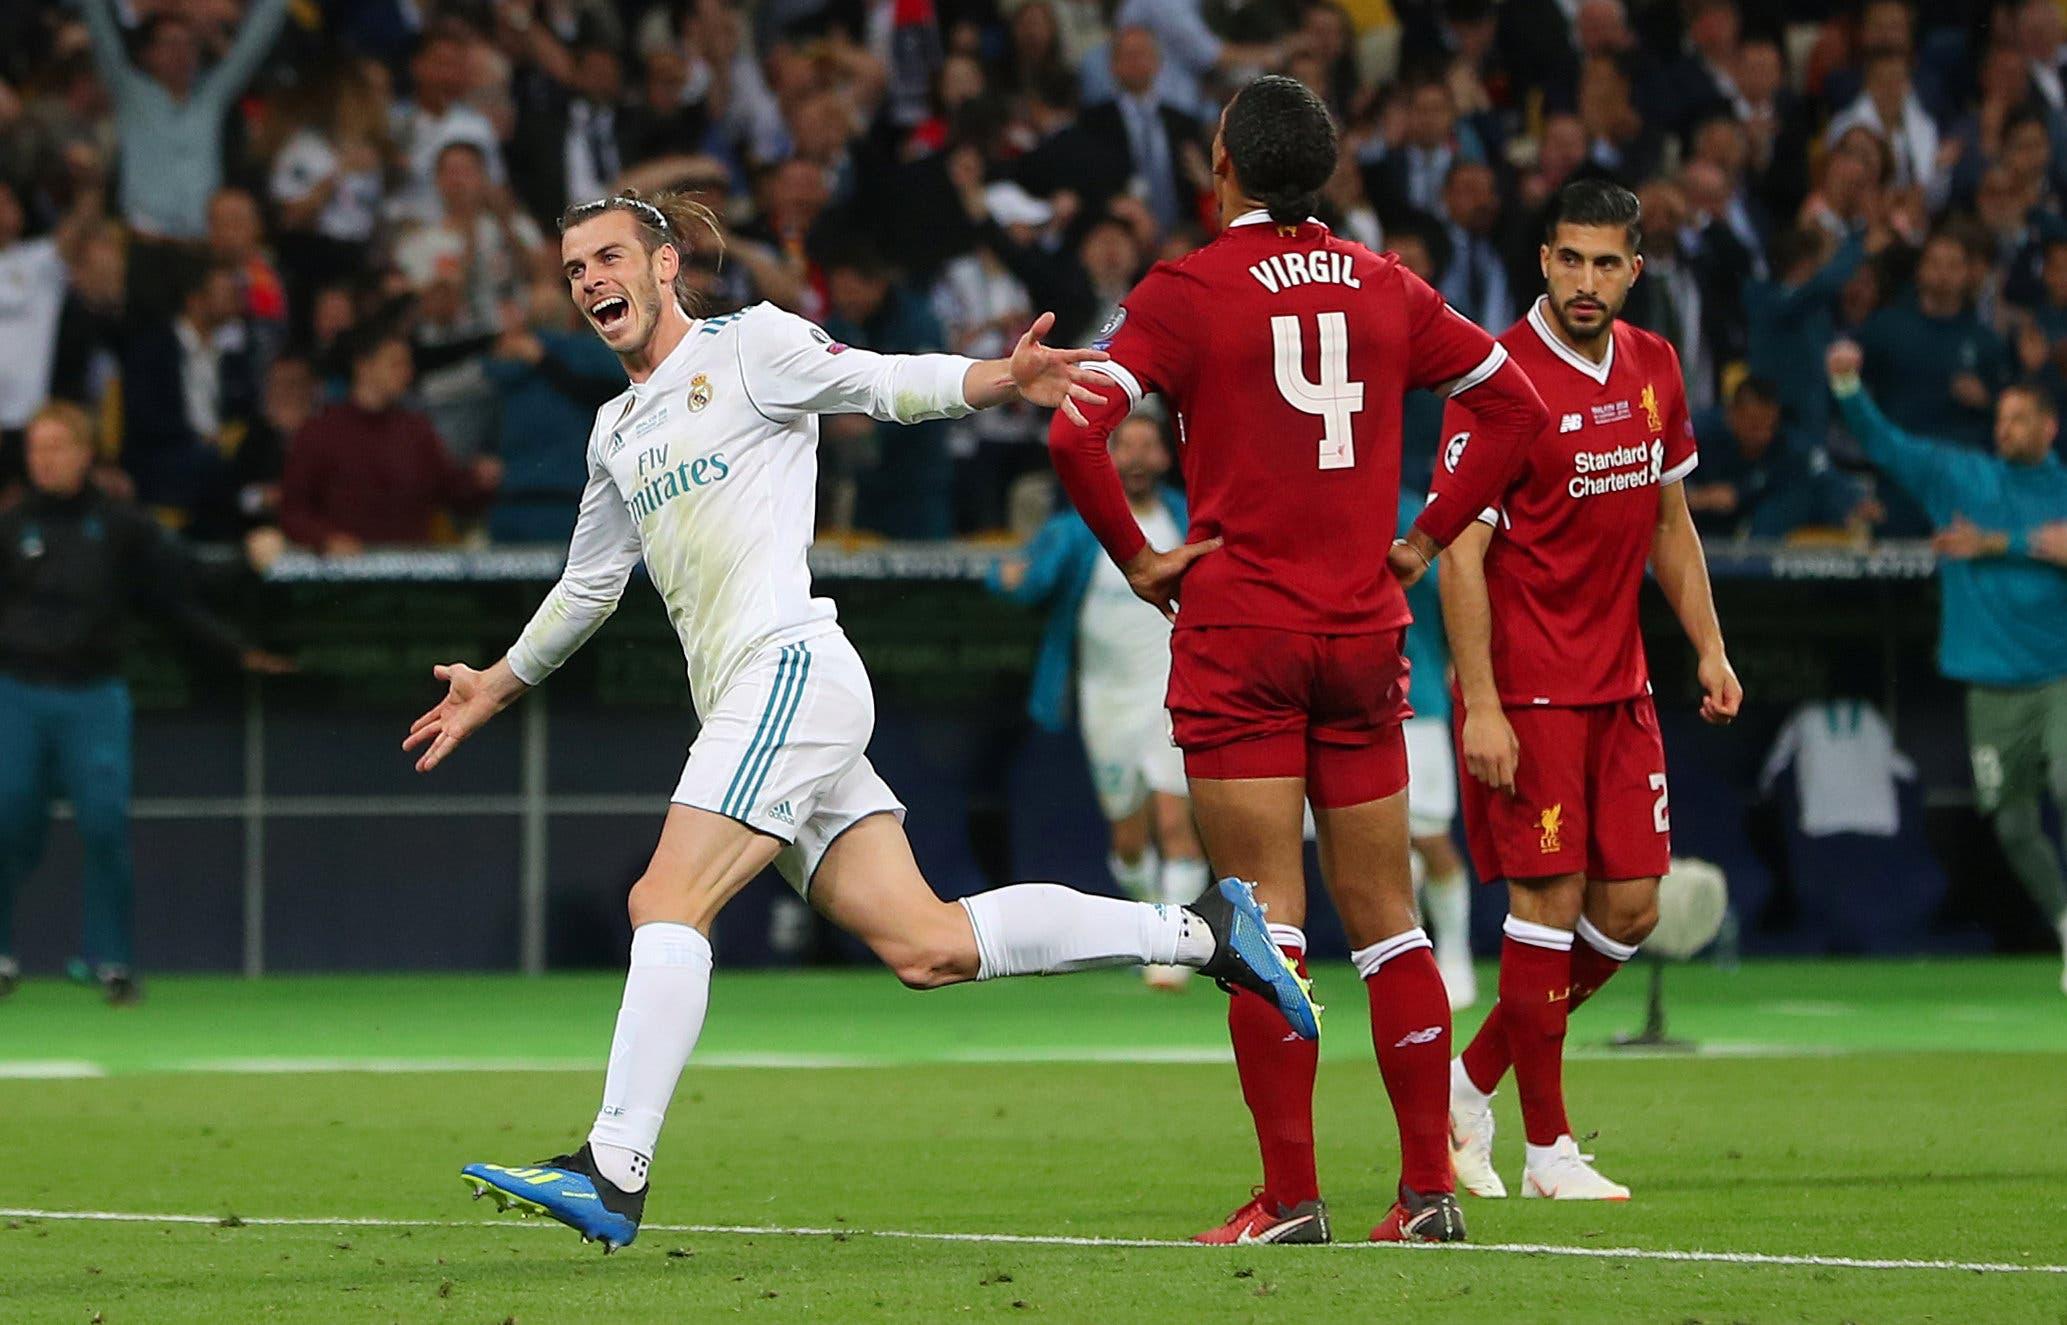 Real Madrid's Gareth Bale celebrates scoring their third goal as Liverpool's Virgil van Dijk and Emre Can look dejected. (Reuters)